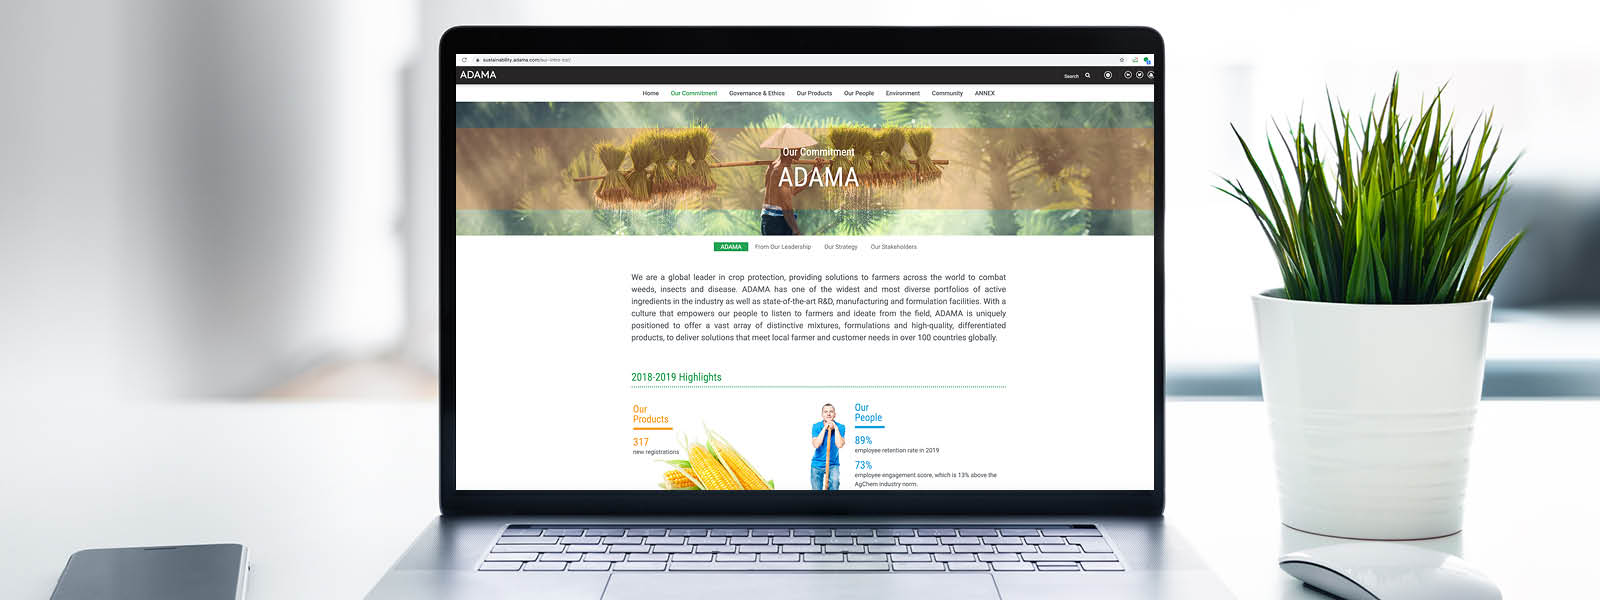 ADAMA Online Sustainability Report 2018-2019